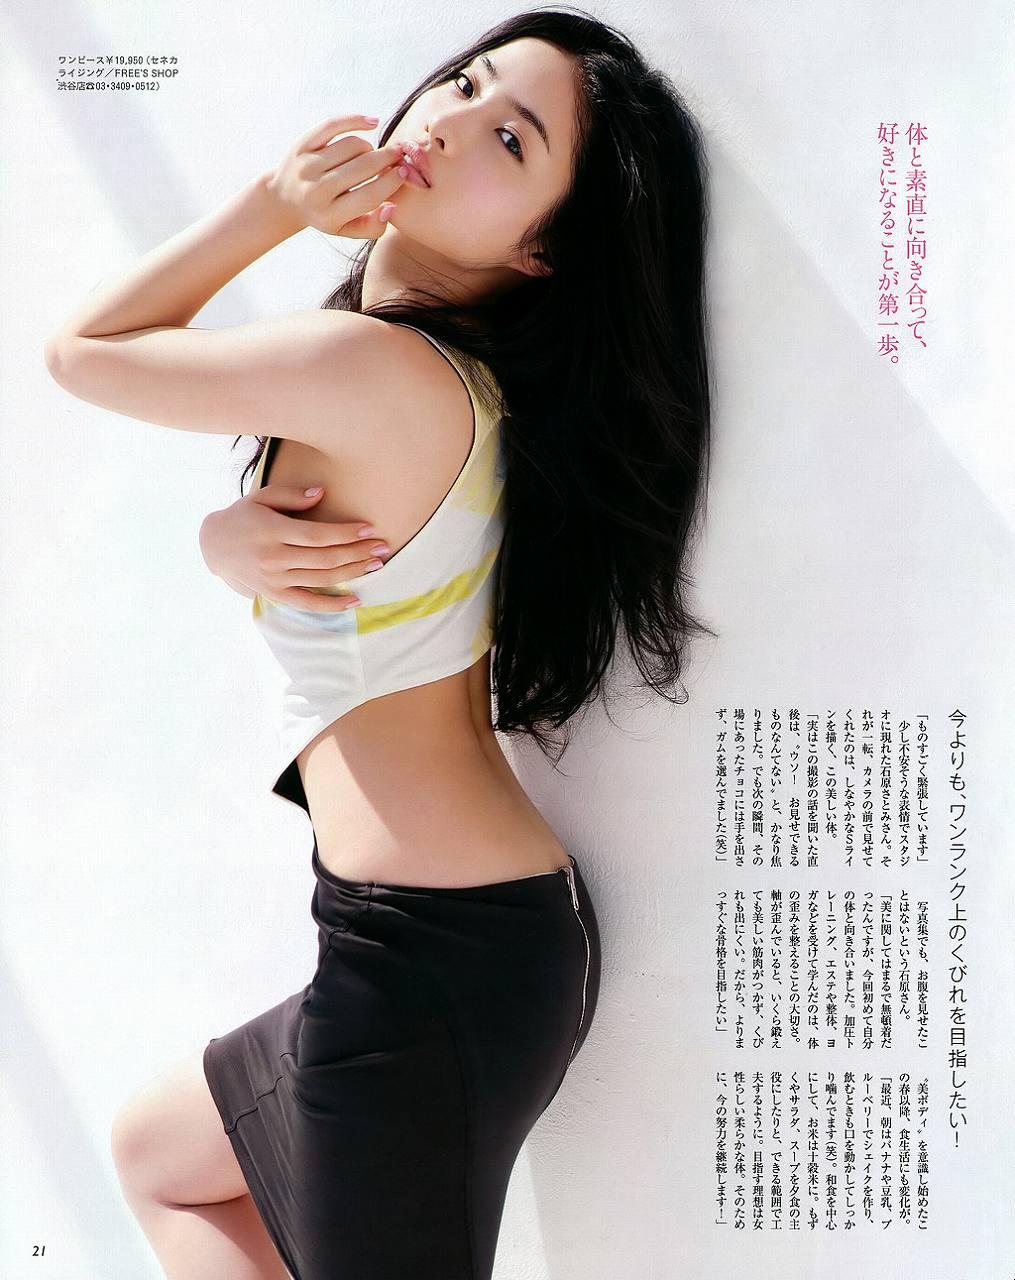 「anan (アンアン) 2010年 6月2日号」石原さとみの背中、腰肉露出グラビア